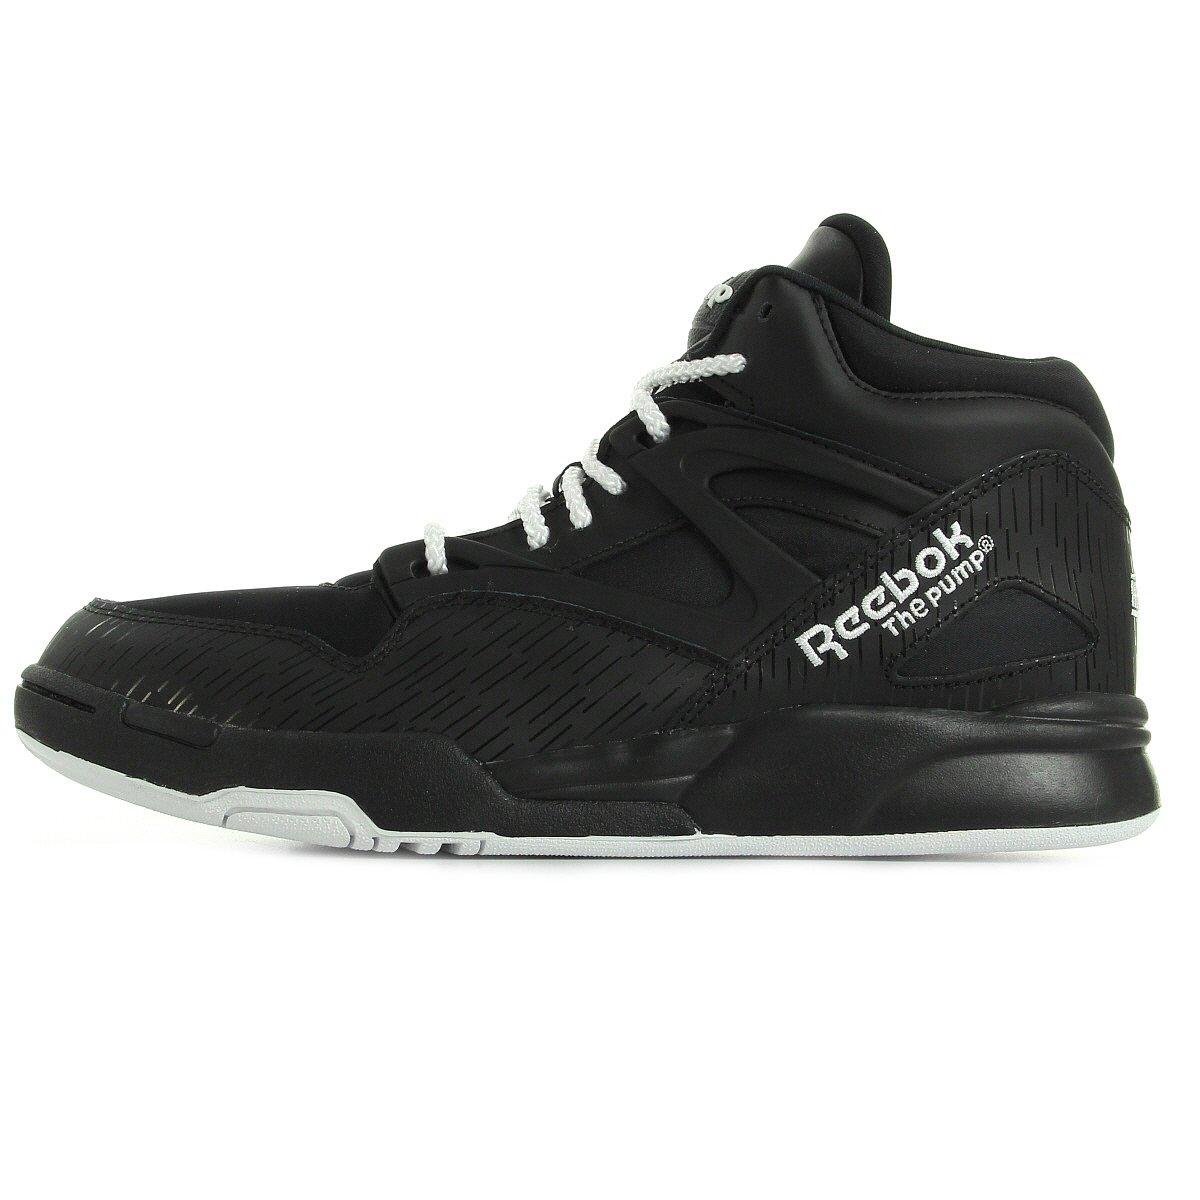 60f85a9b0f5a Reebok PUMP OMNI LITE RP M49400 Unisex-adult Sports Shoe